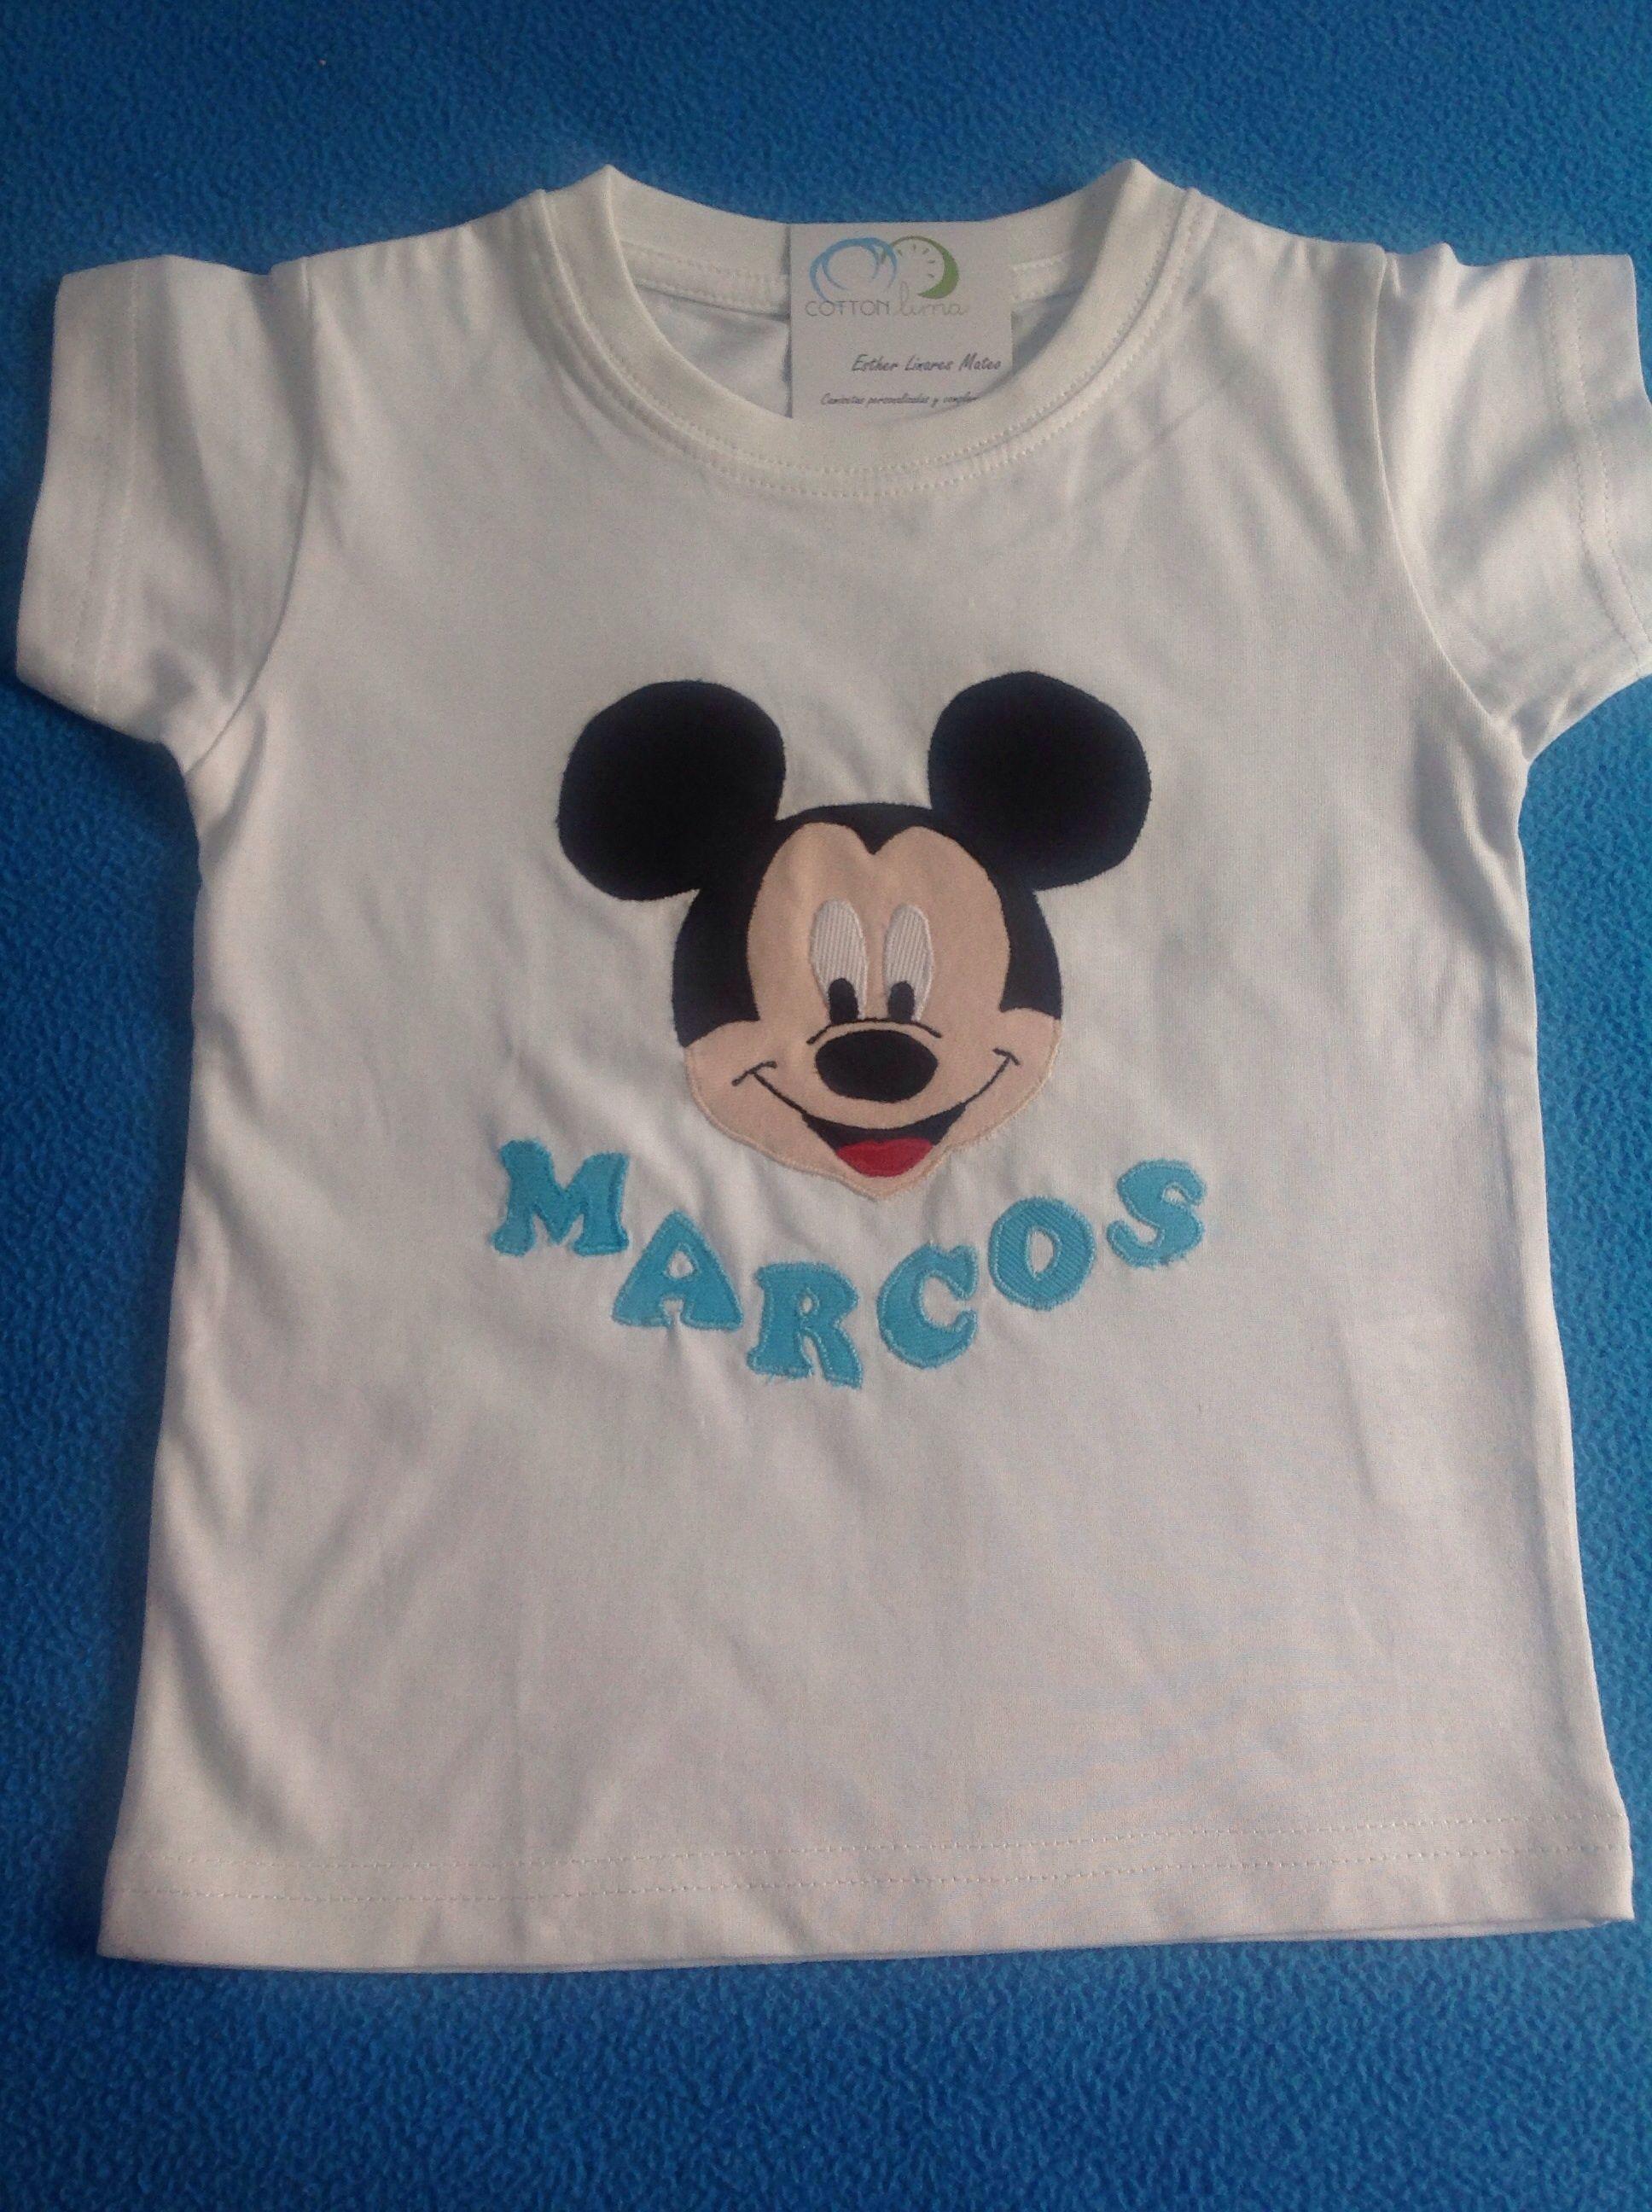 Para Marcos camiseta personalizada #facebookcottonlima | camisetas ...